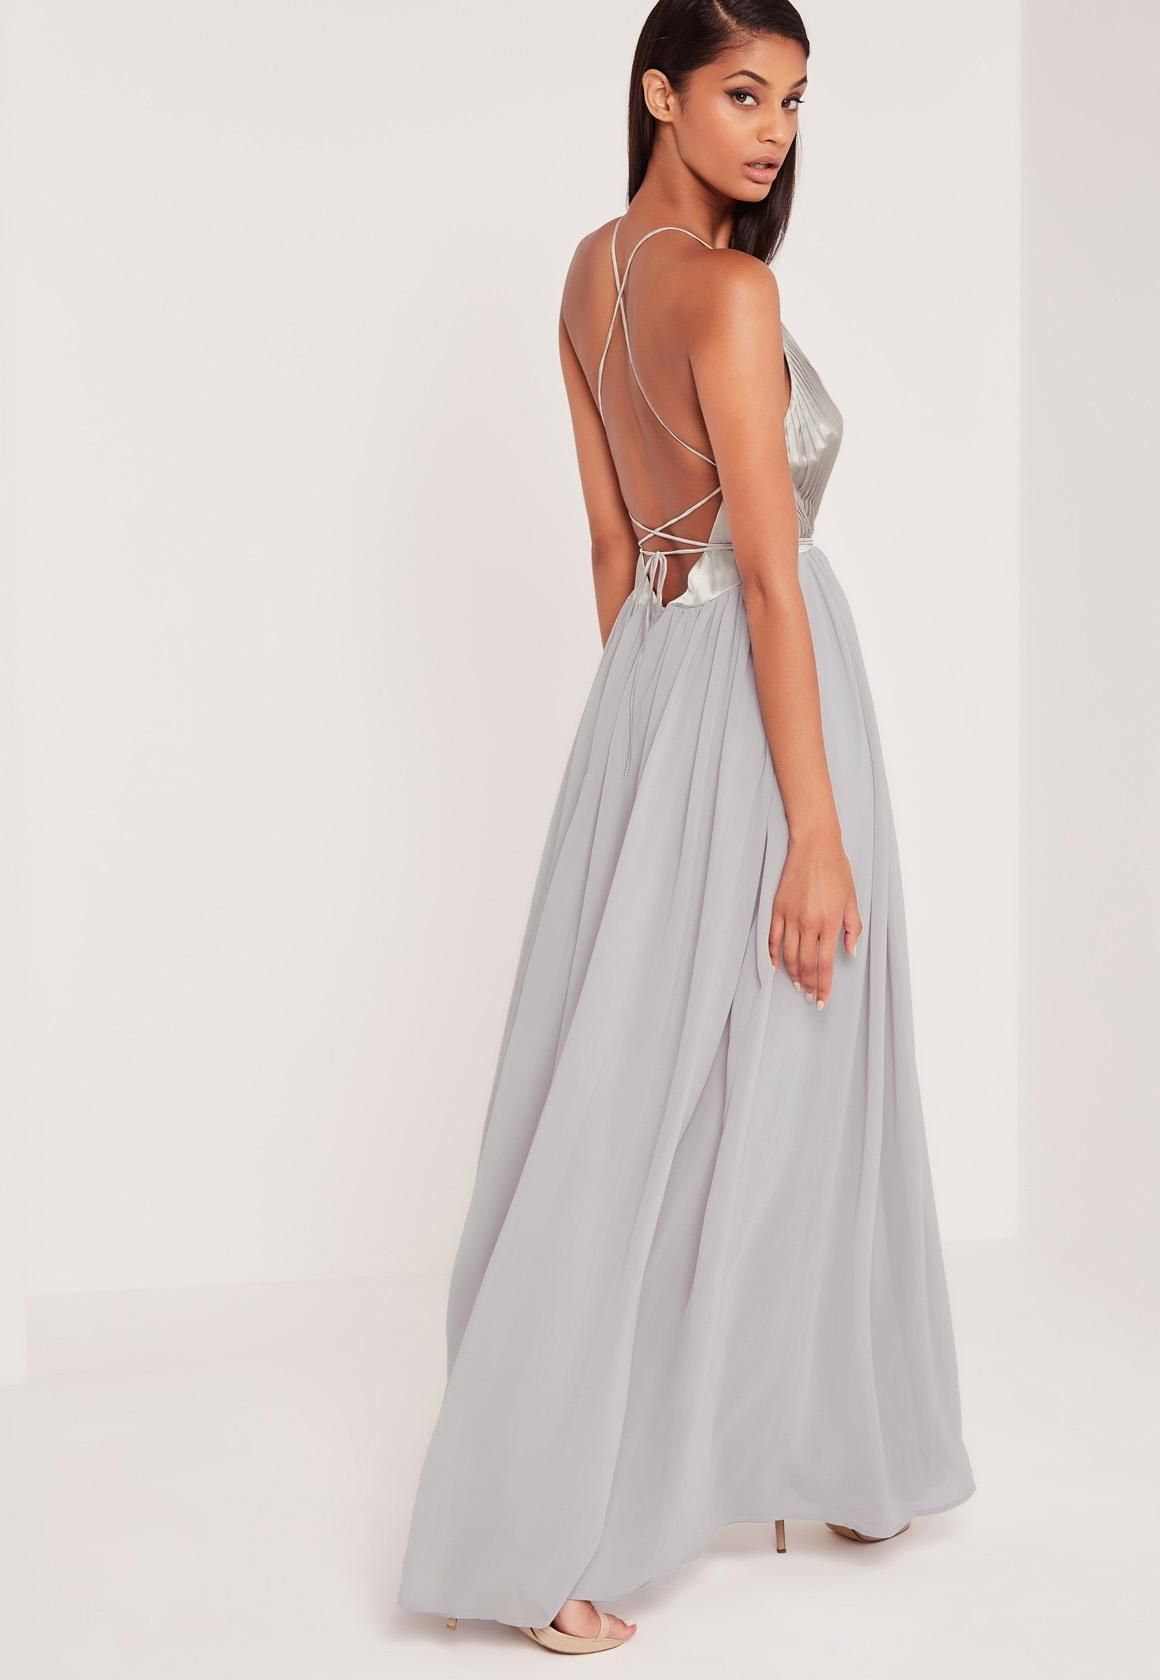 Missguided - Carli Bybel Pleated Silky Maxi Dress Grey | Stylishious ...